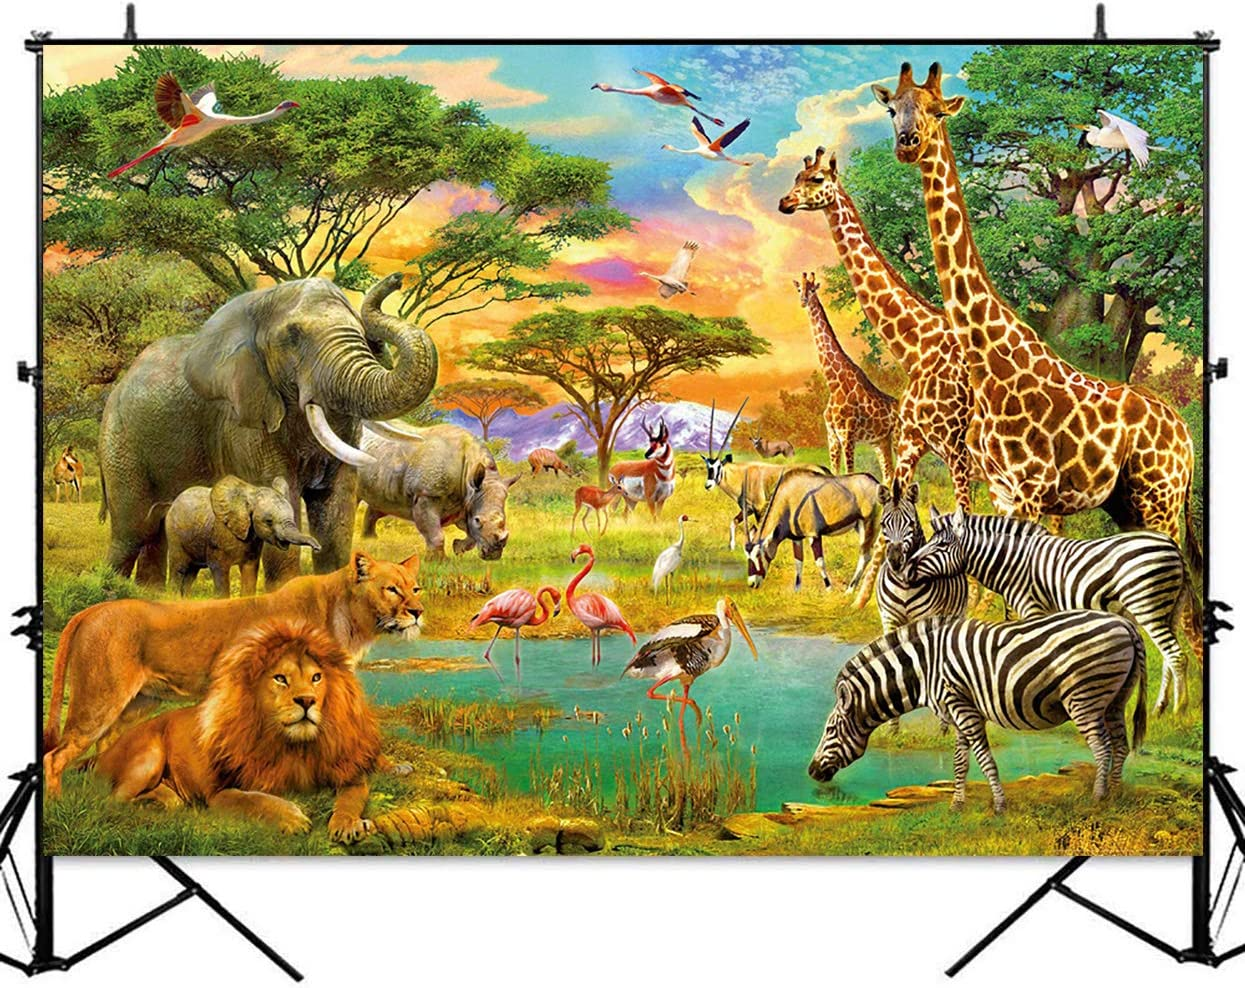 Vines Animals Lion Zoo Cake Smash Safari Jungle Animal Birthday Photography Backdrop Wild Birthday Fern Leaves Cheetah Print Party